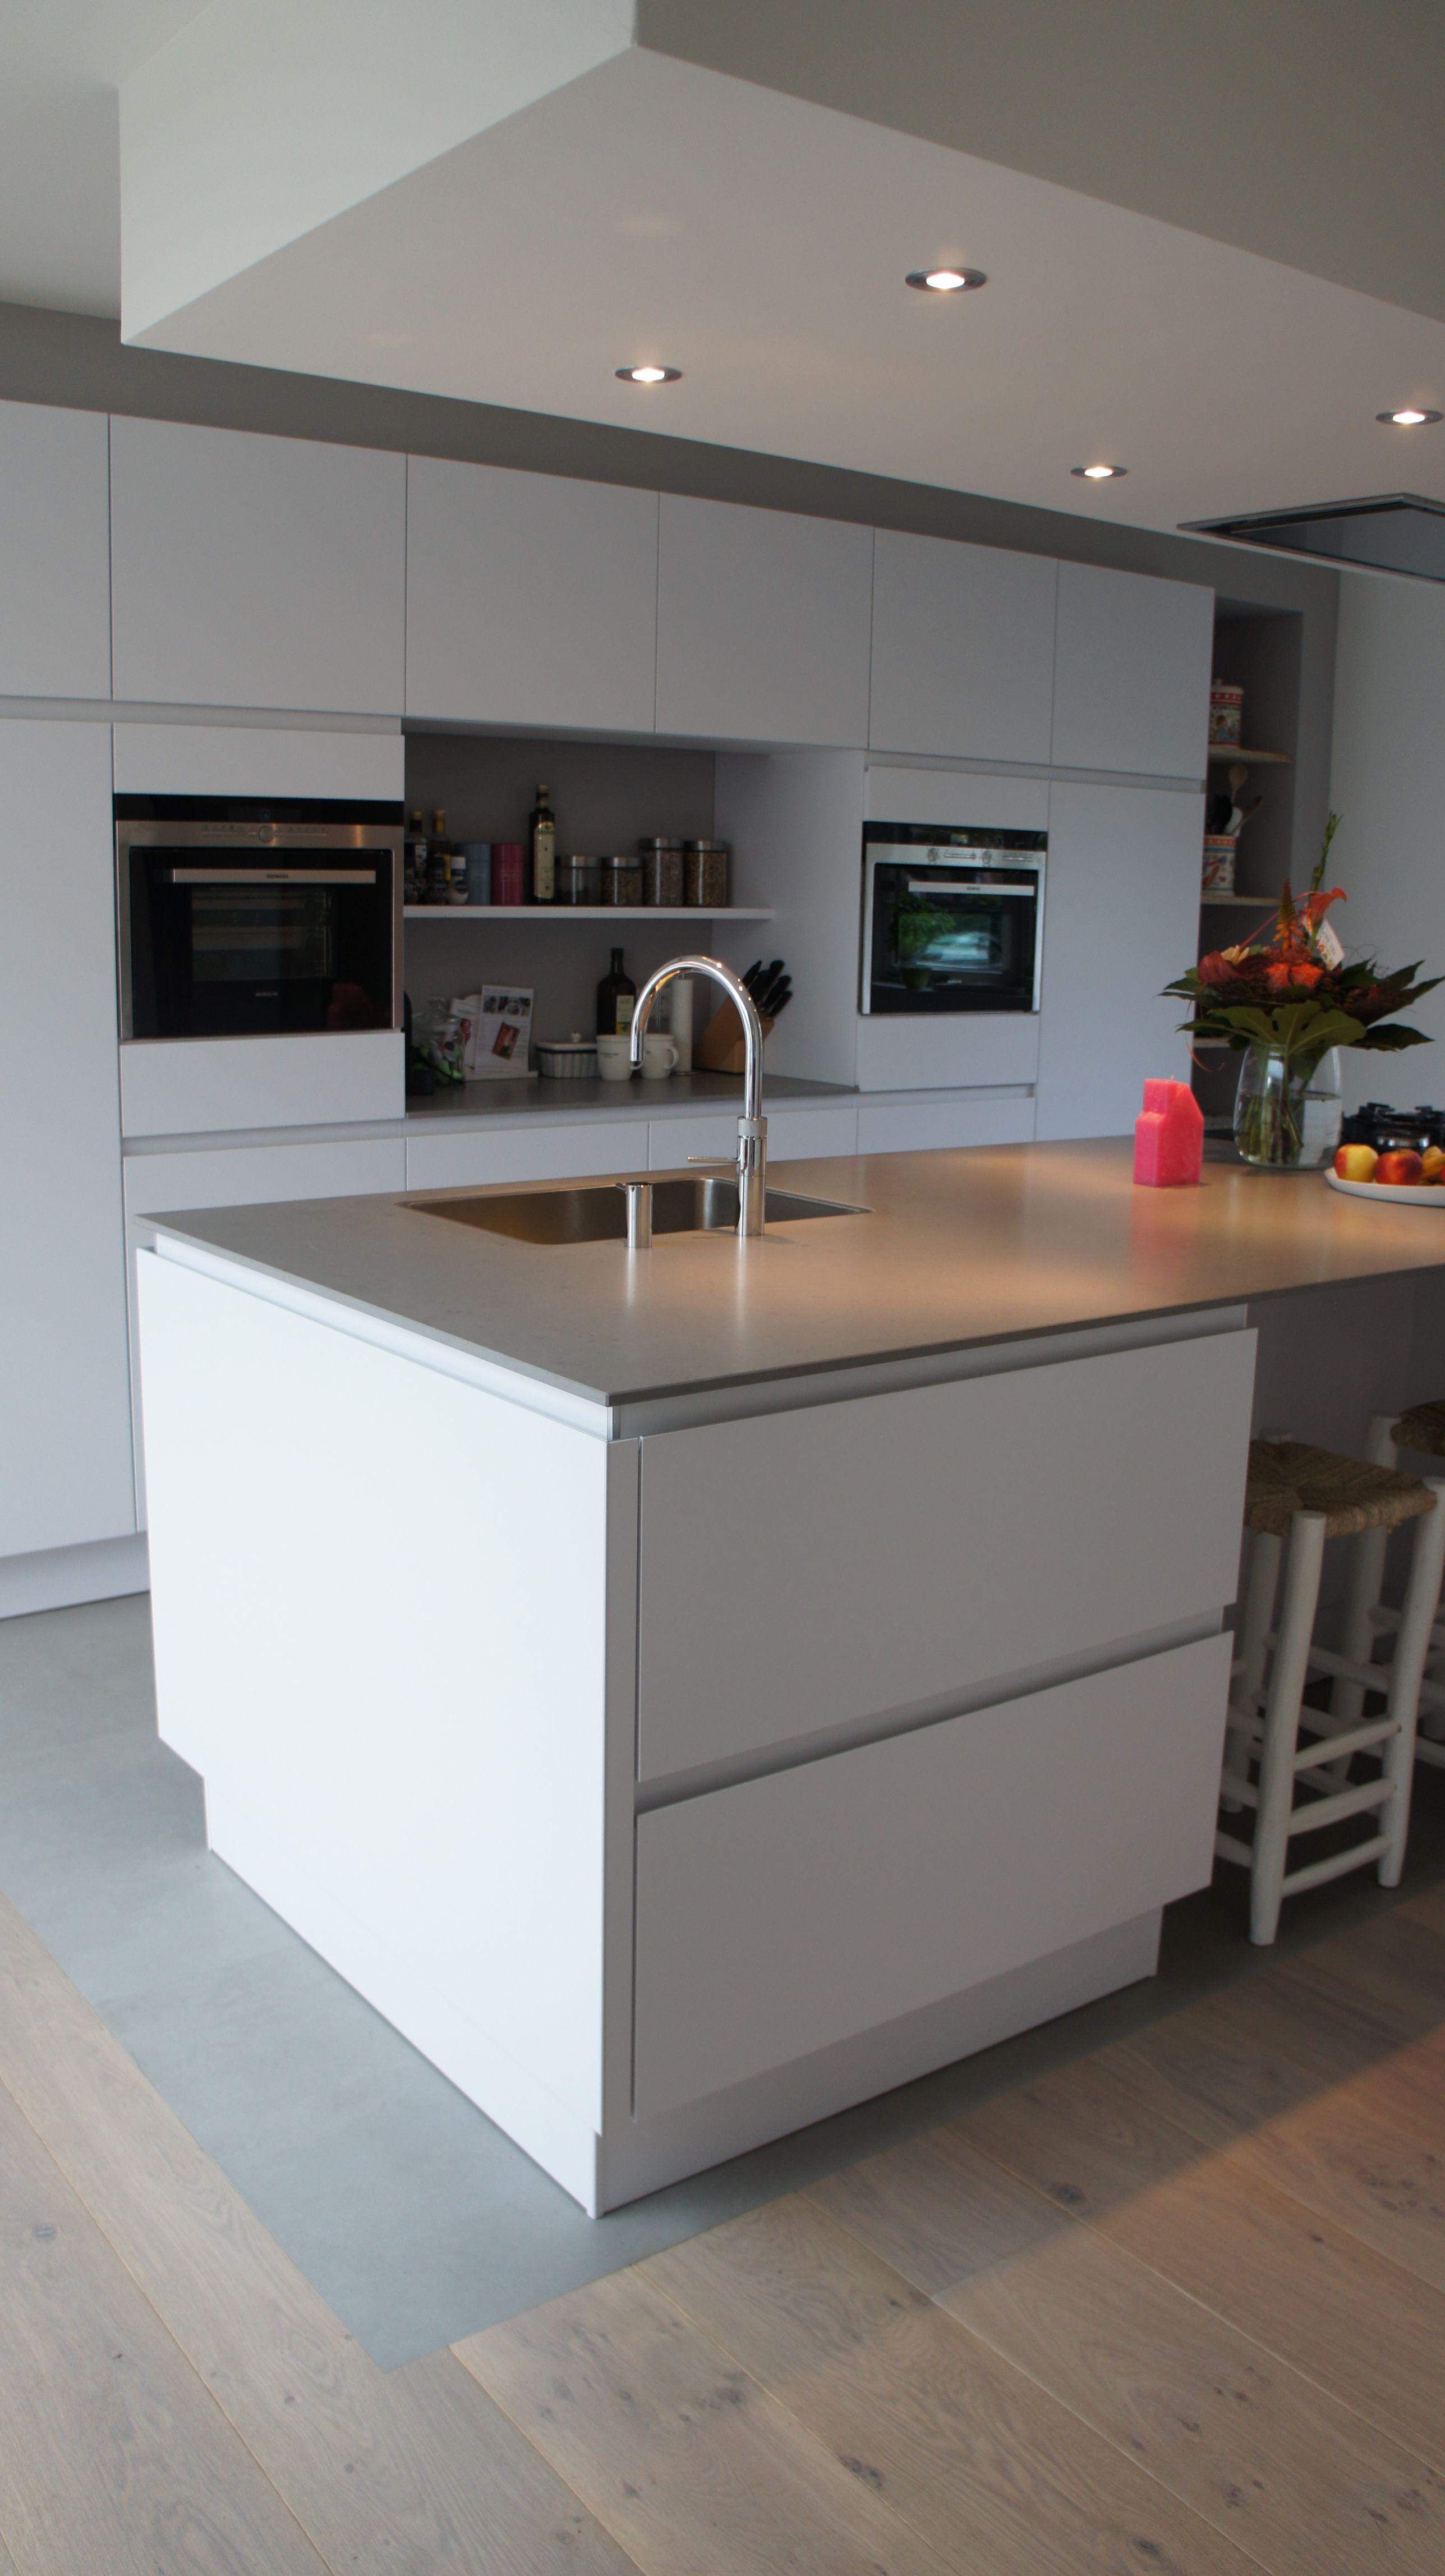 morefloors vloeren breda europees eiken multiplank geschuurd licht gerookt wit 4 9x180 breed. Black Bedroom Furniture Sets. Home Design Ideas